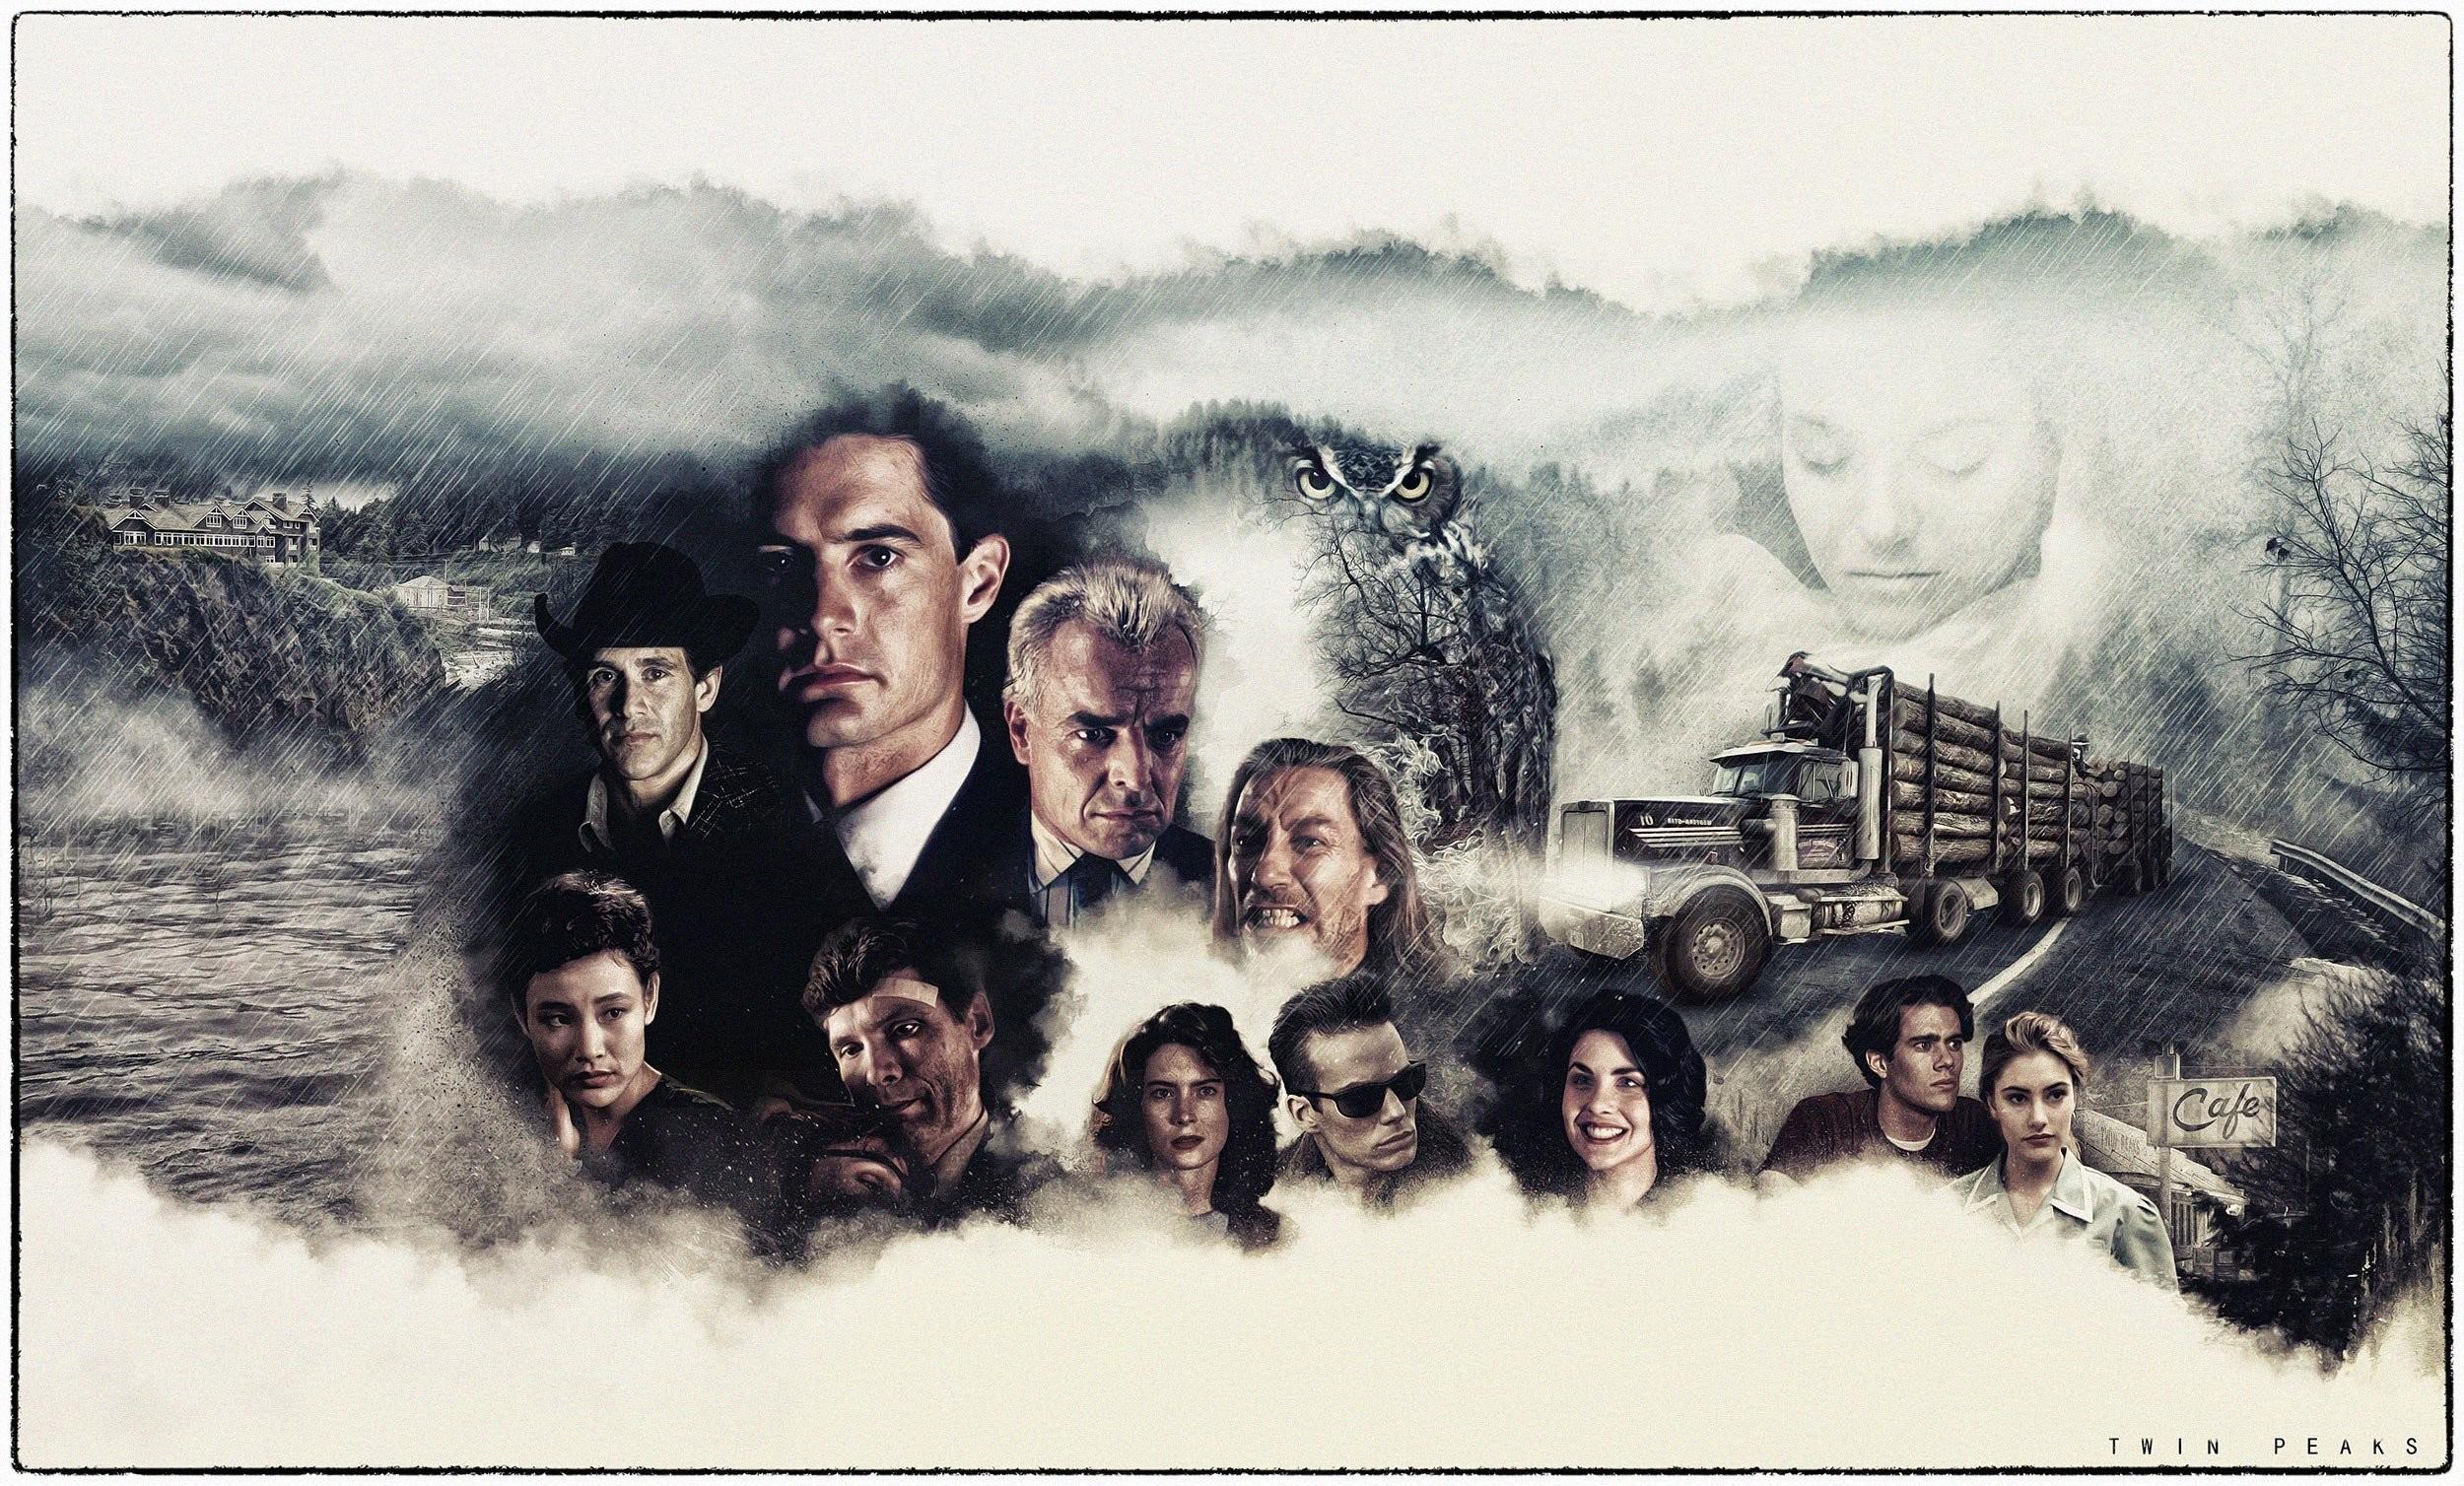 TWIN PEAKS crime drama series mystery fbi 1peaks horror poster wallpaper |  | 939316 | WallpaperUP